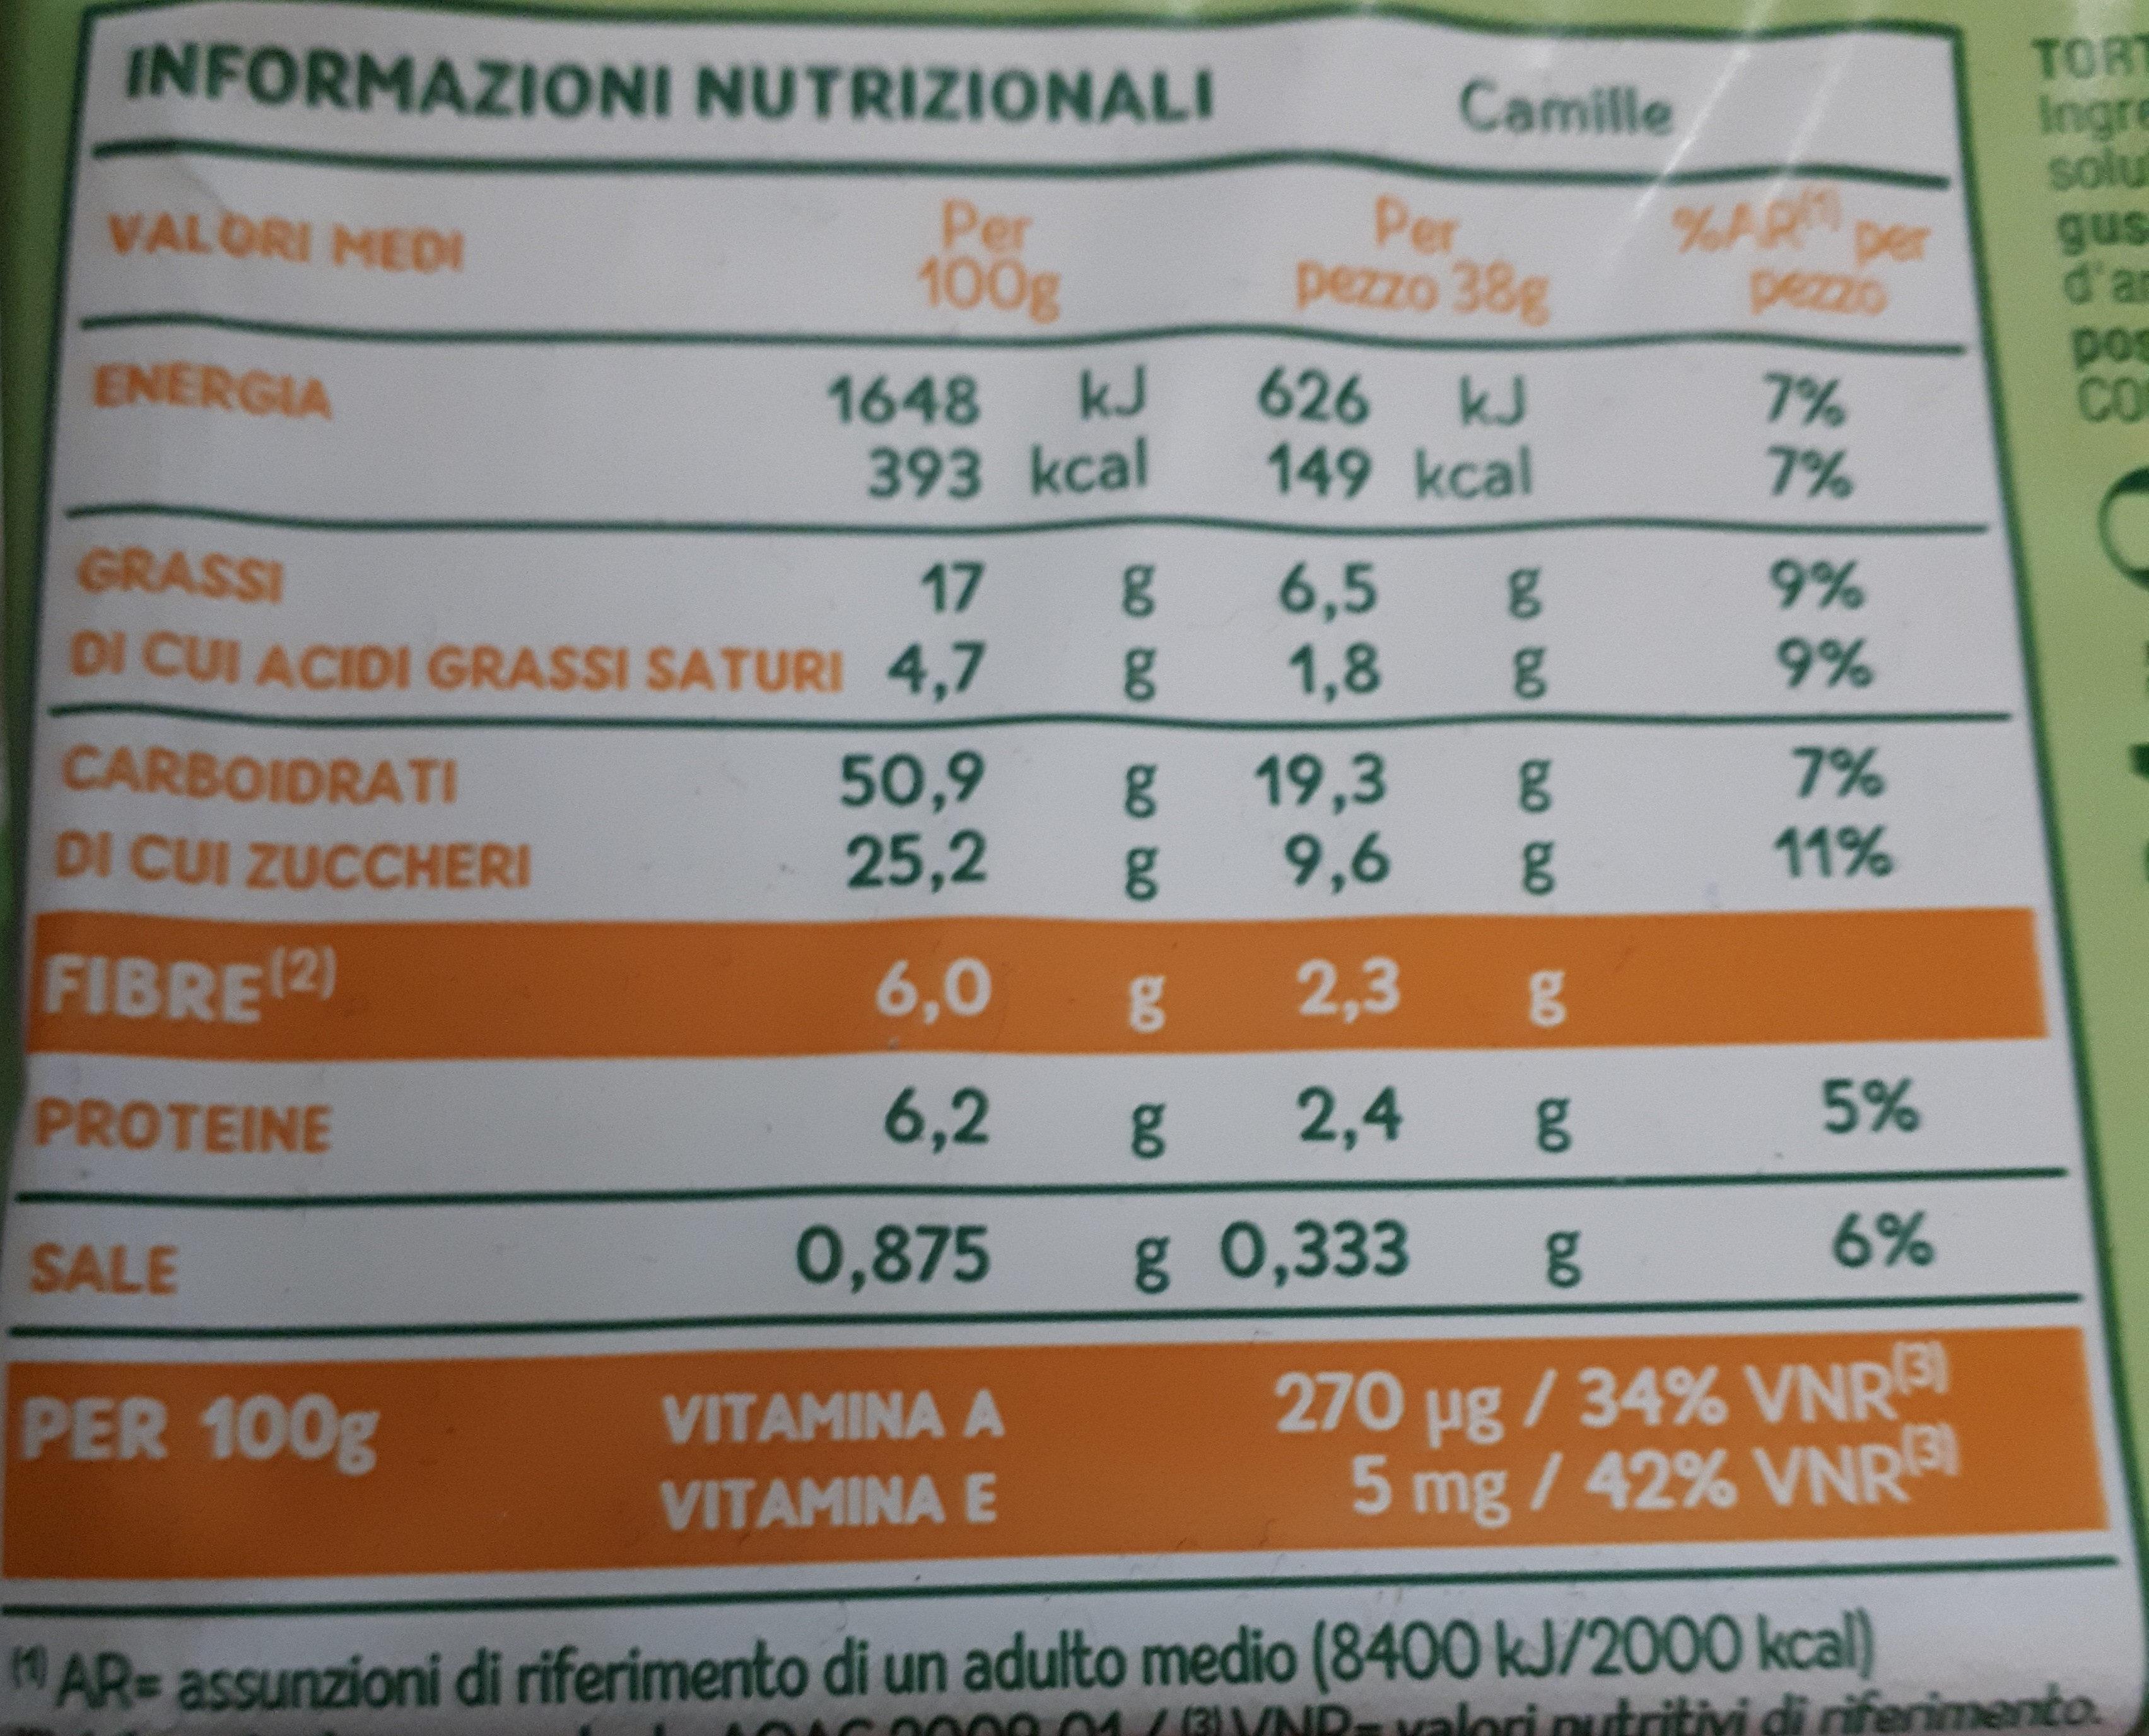 Camille - Informació nutricional - it